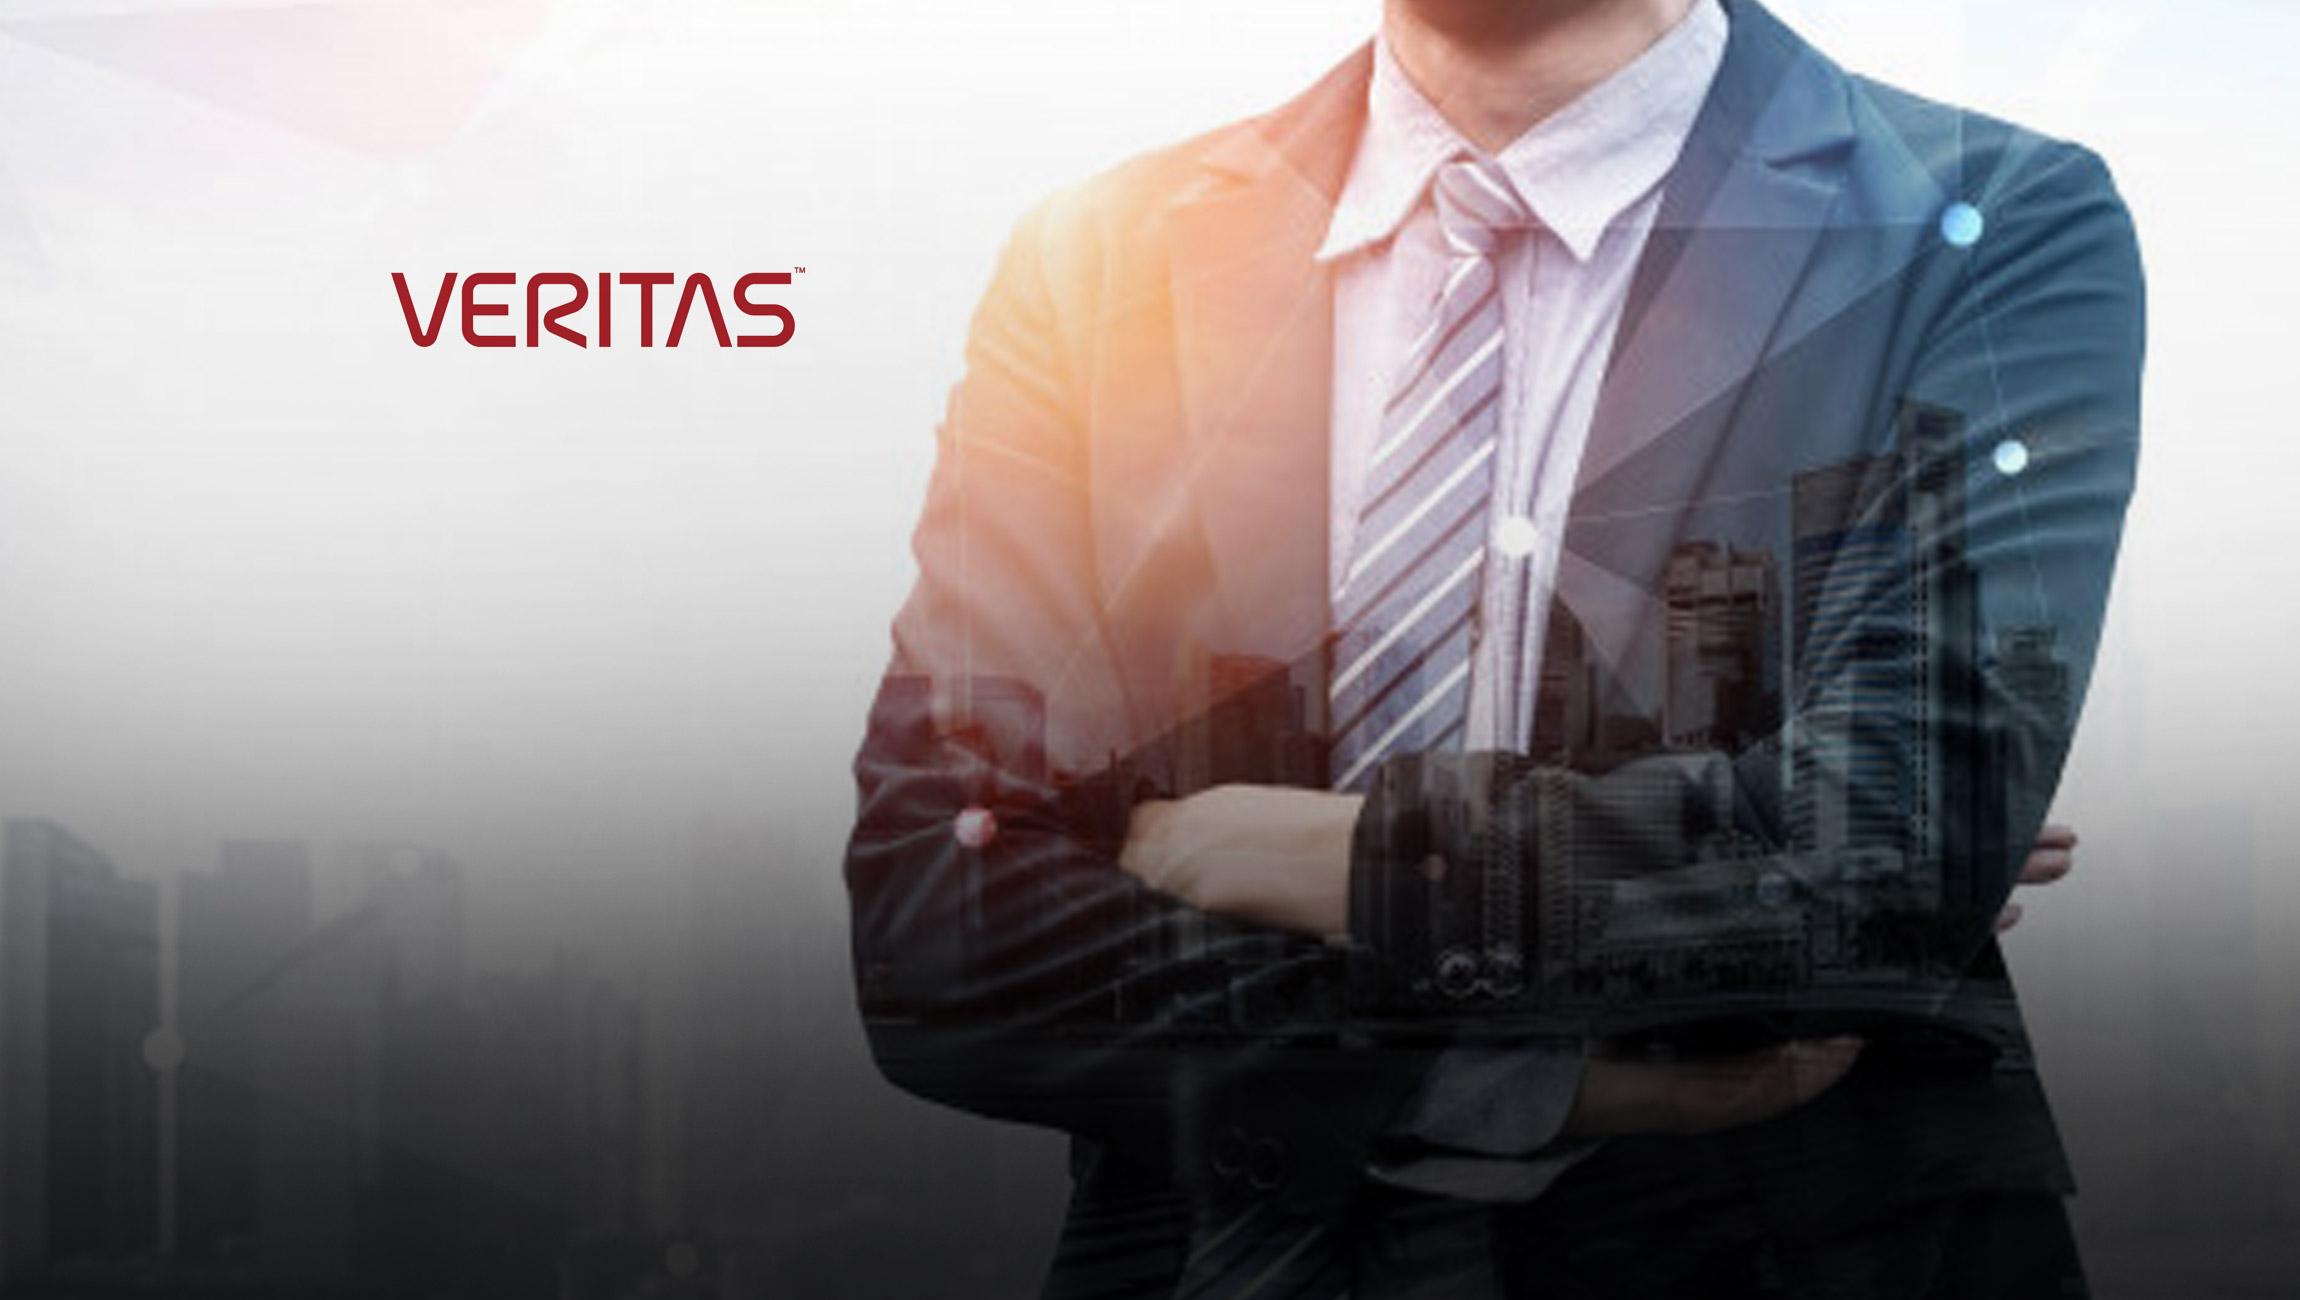 Veritas Appoints Phil Brace as New Worldwide Field Operations Leader, Combines Product Under Deepak Mohan